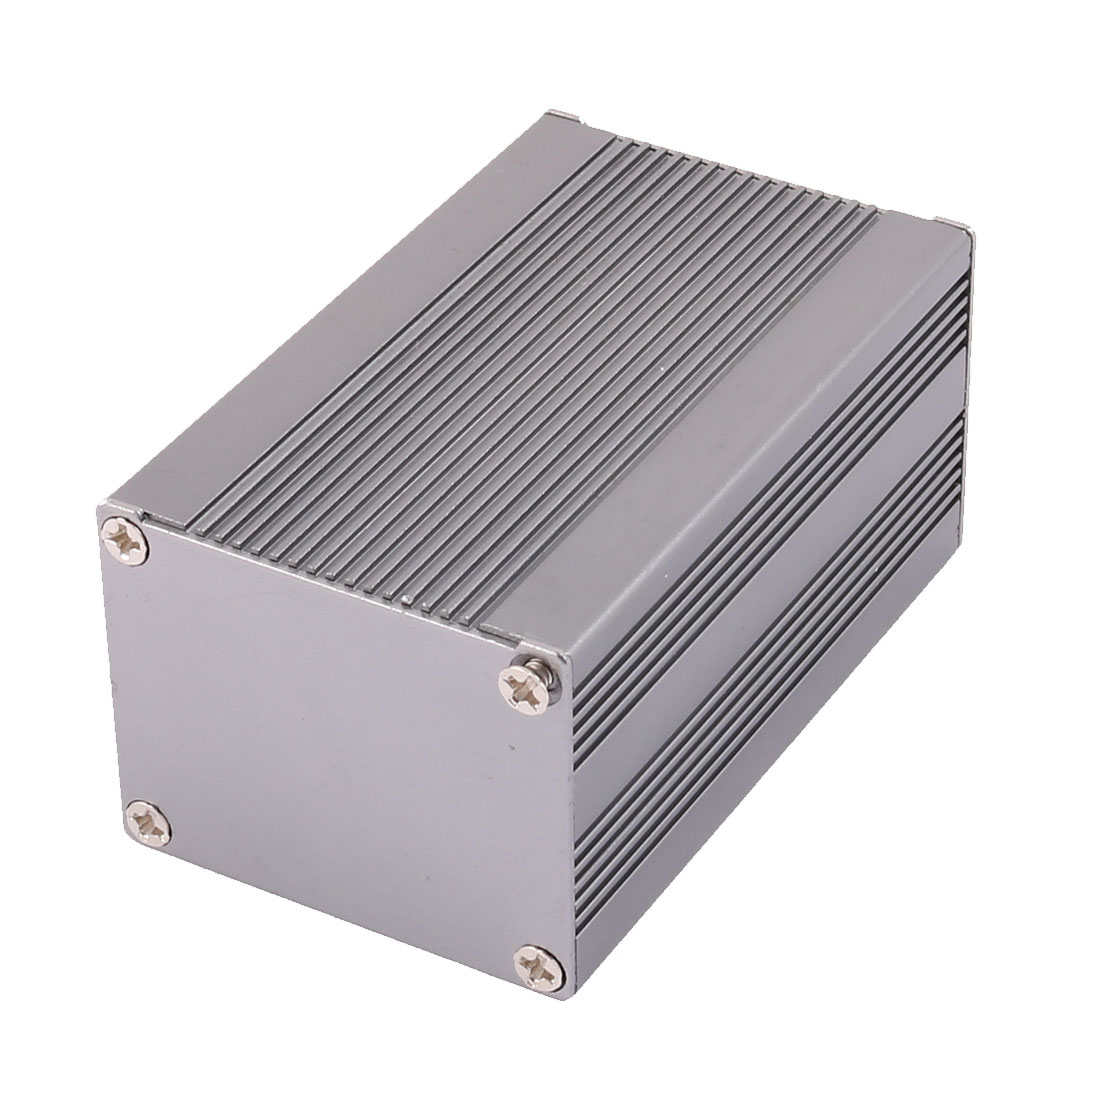 83 x 50 x 40mm Multi-purpose Electronic Extruded Aluminum Enclosure Case Gray